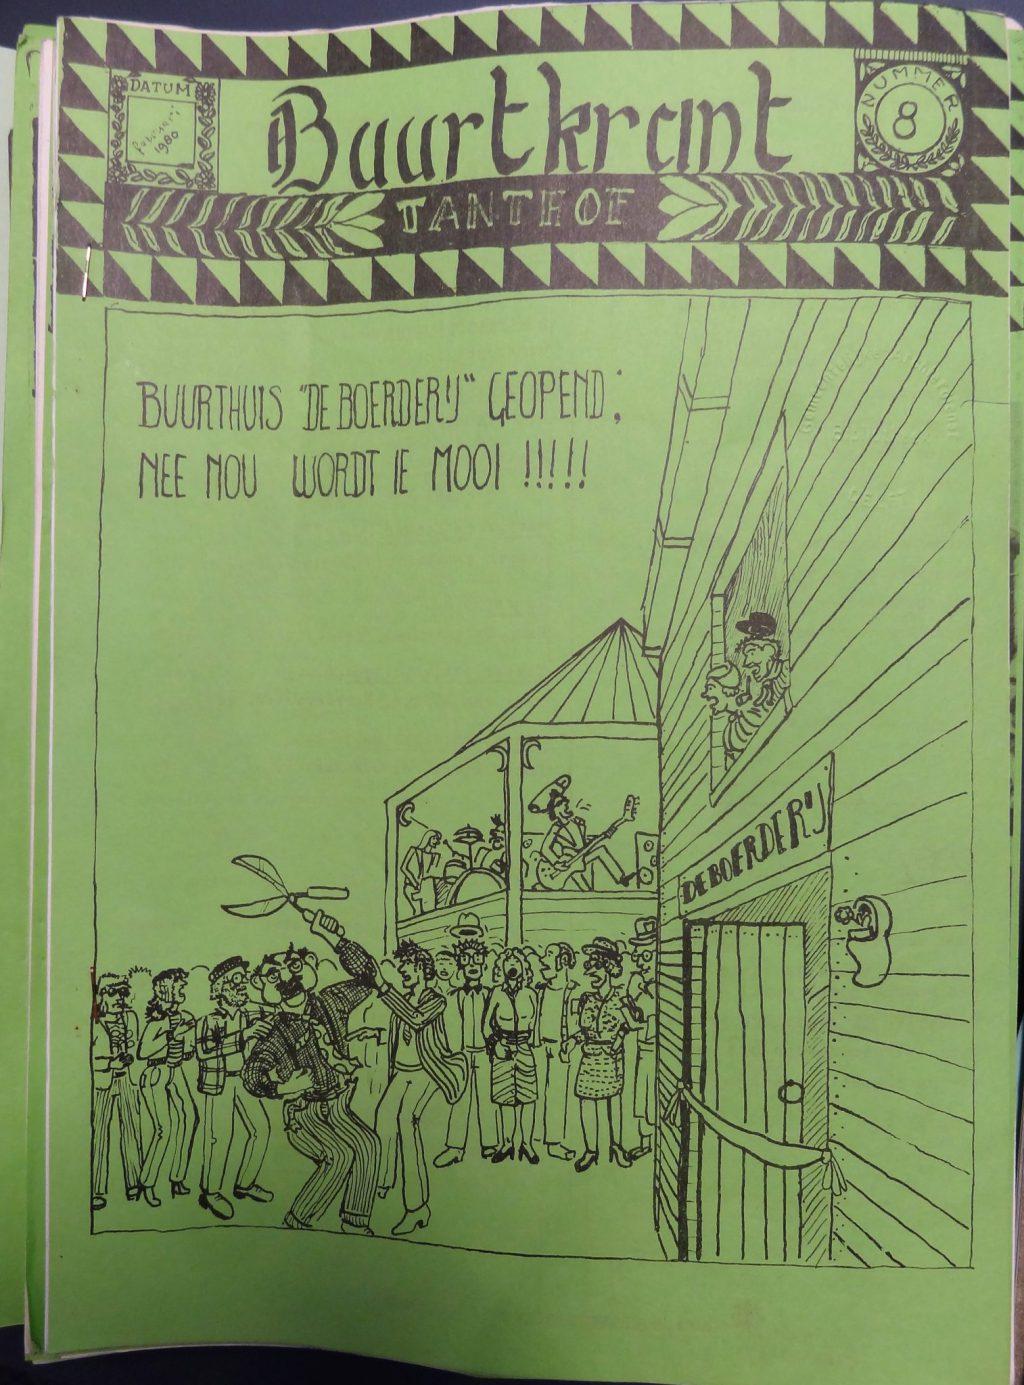 Tanthof Buurtkrant, februari 1980 (bibliotheek)